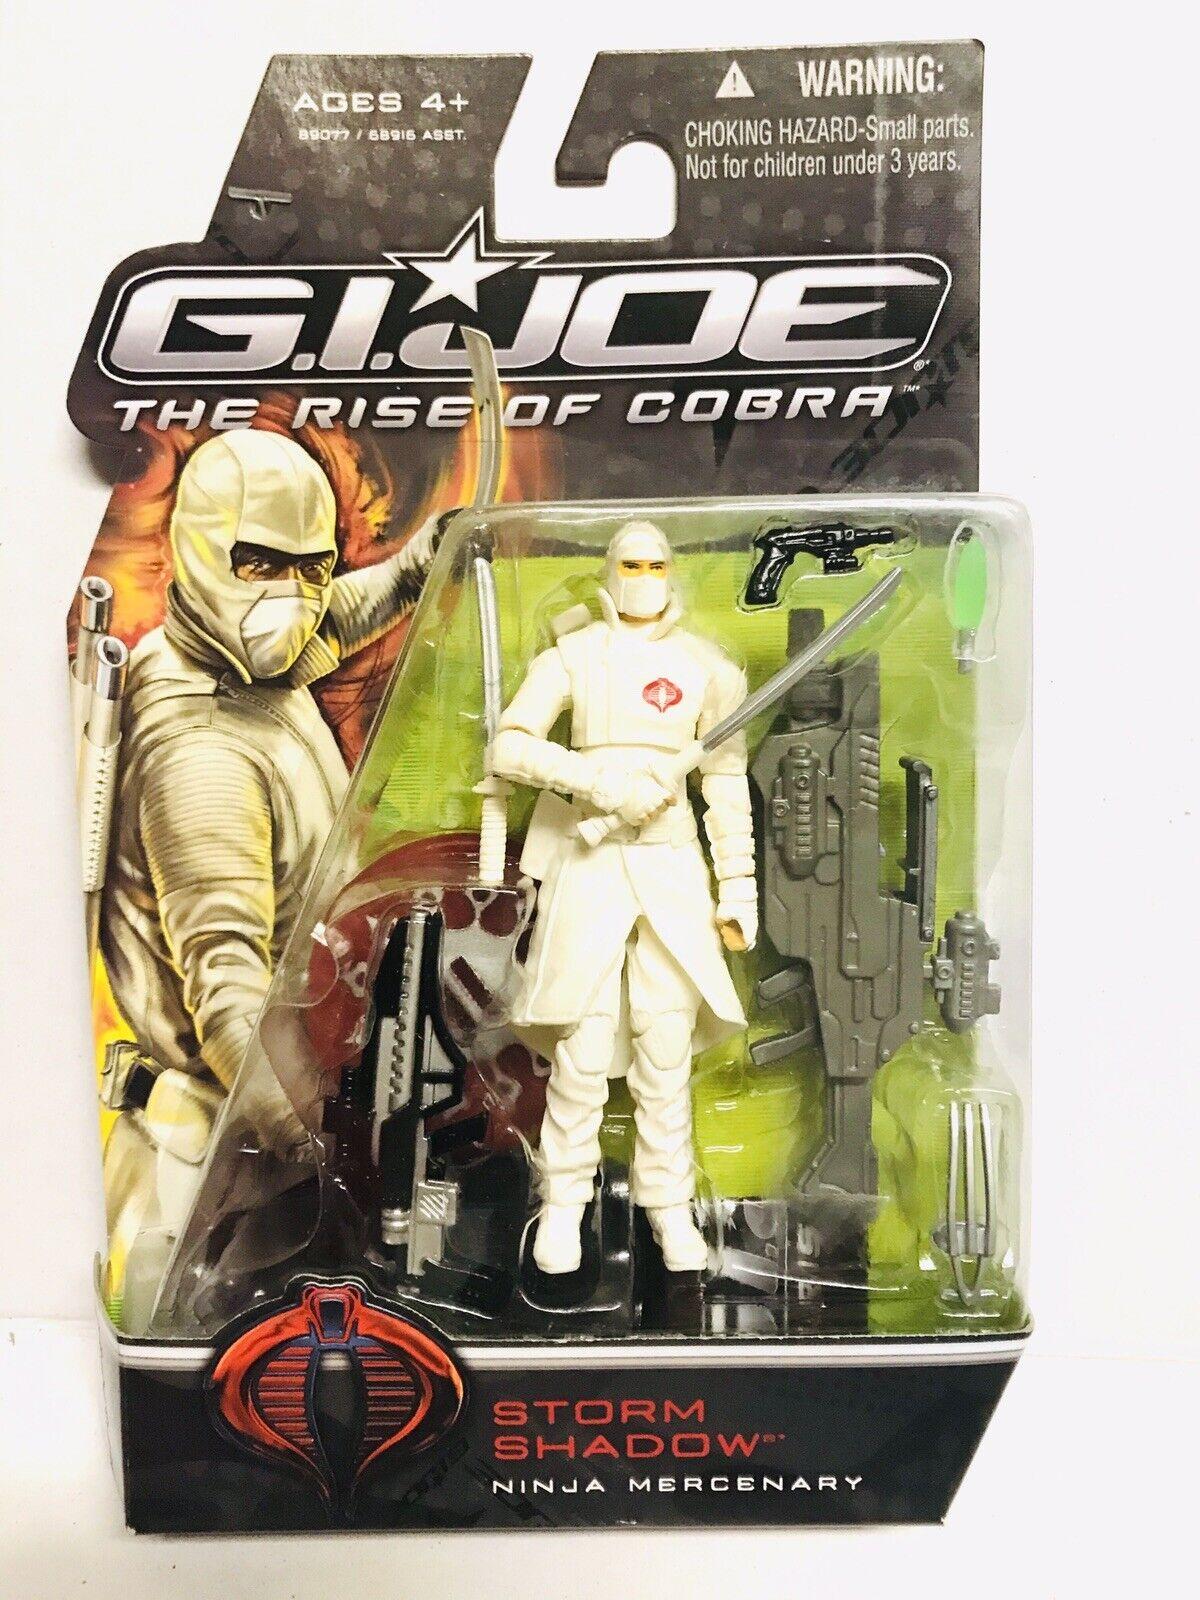 Gi Joe The Rise Of Cobra 2009 Storm Shadow Figure Hasbro Brand For Sale Online Ebay